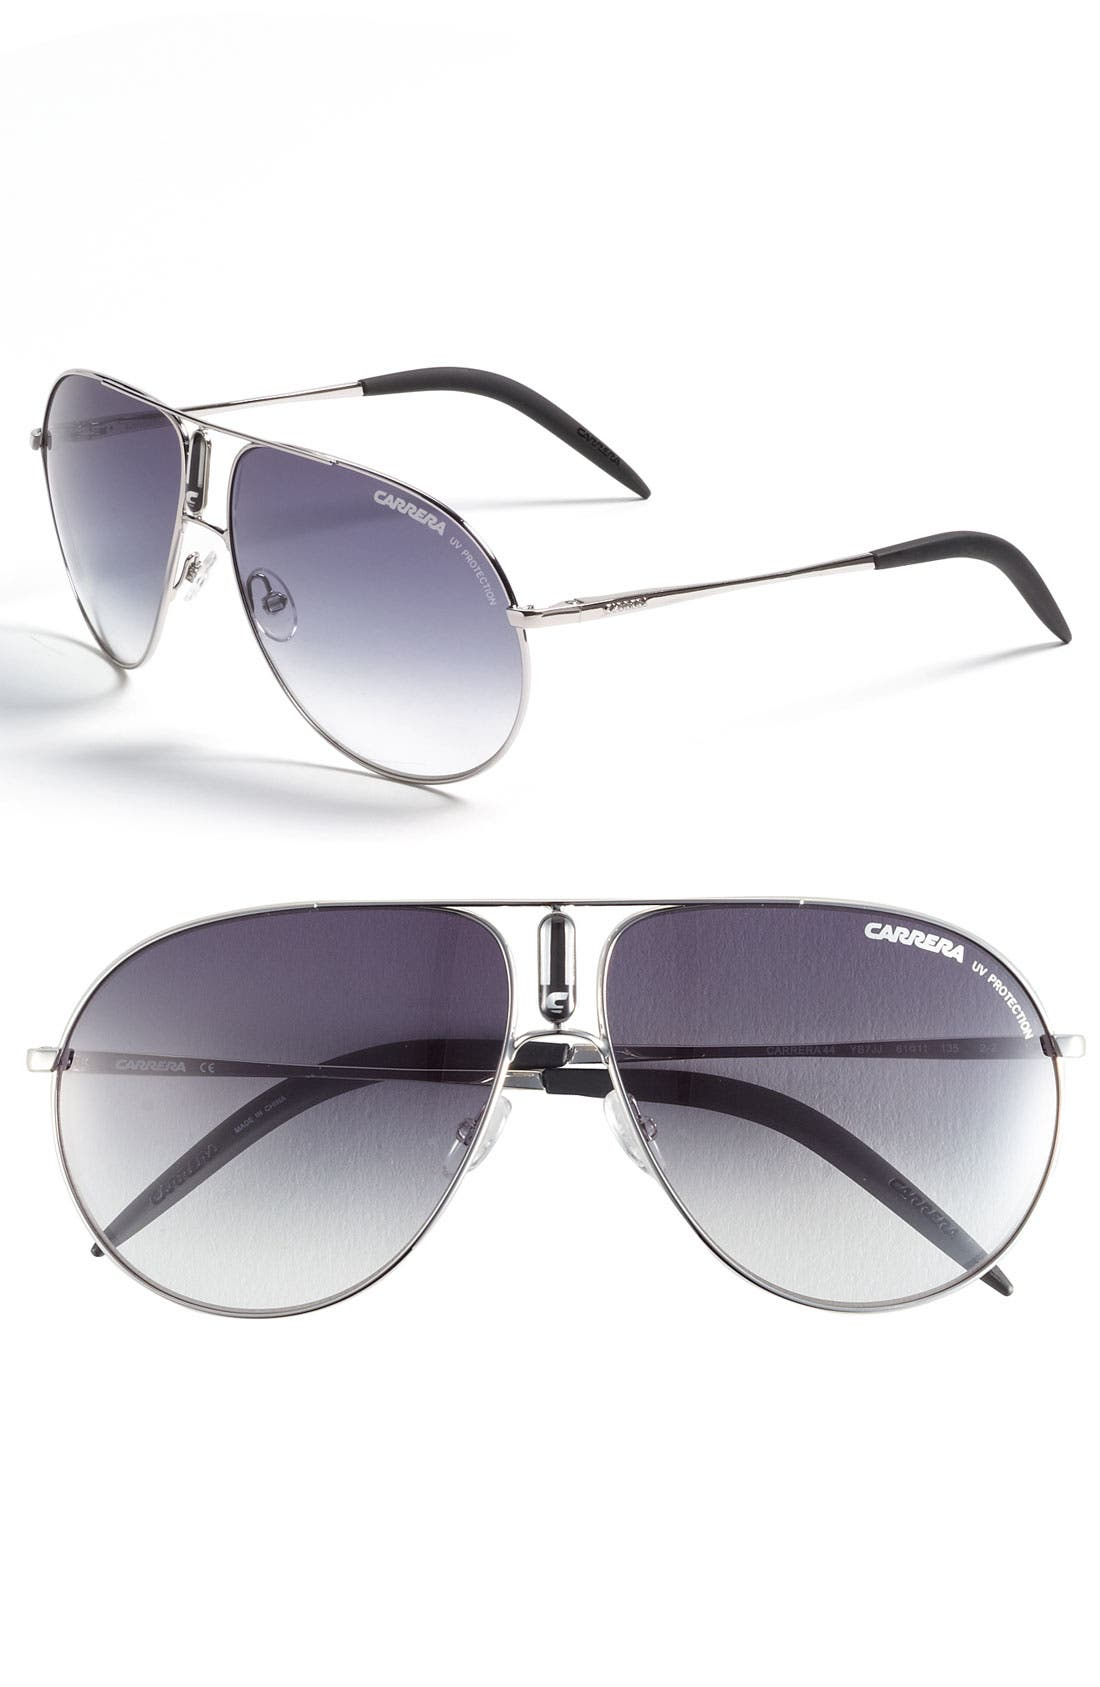 Alternate Image 1 Selected - Carrera Eyewear 61mm Aviator Sunglasses